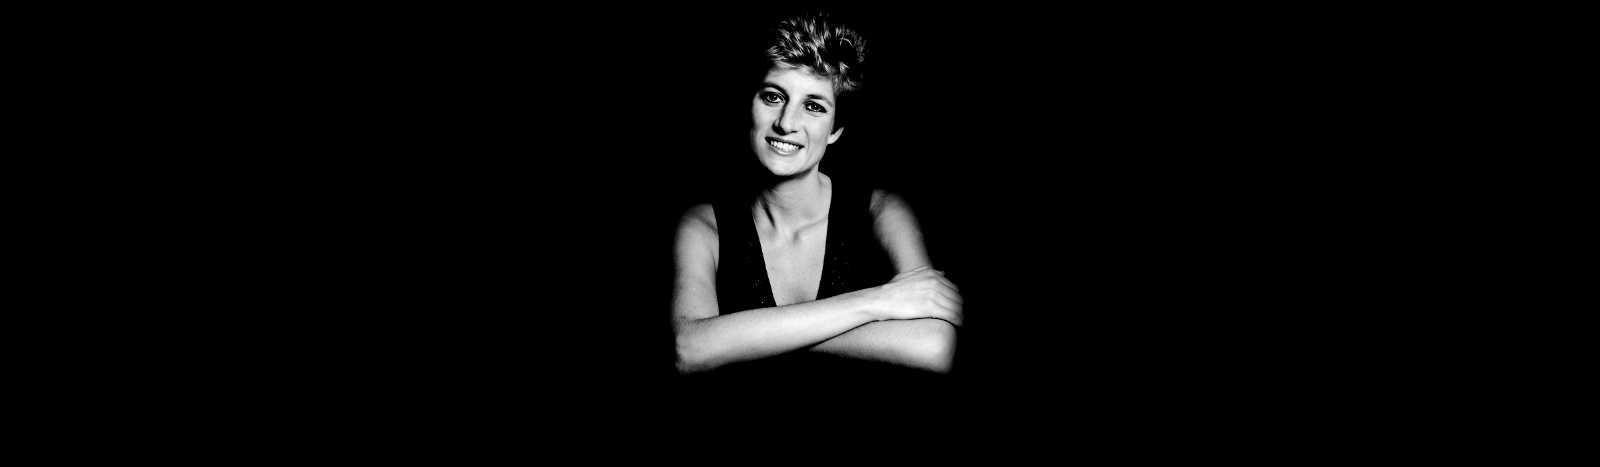 Portrait photo of Princes Diana